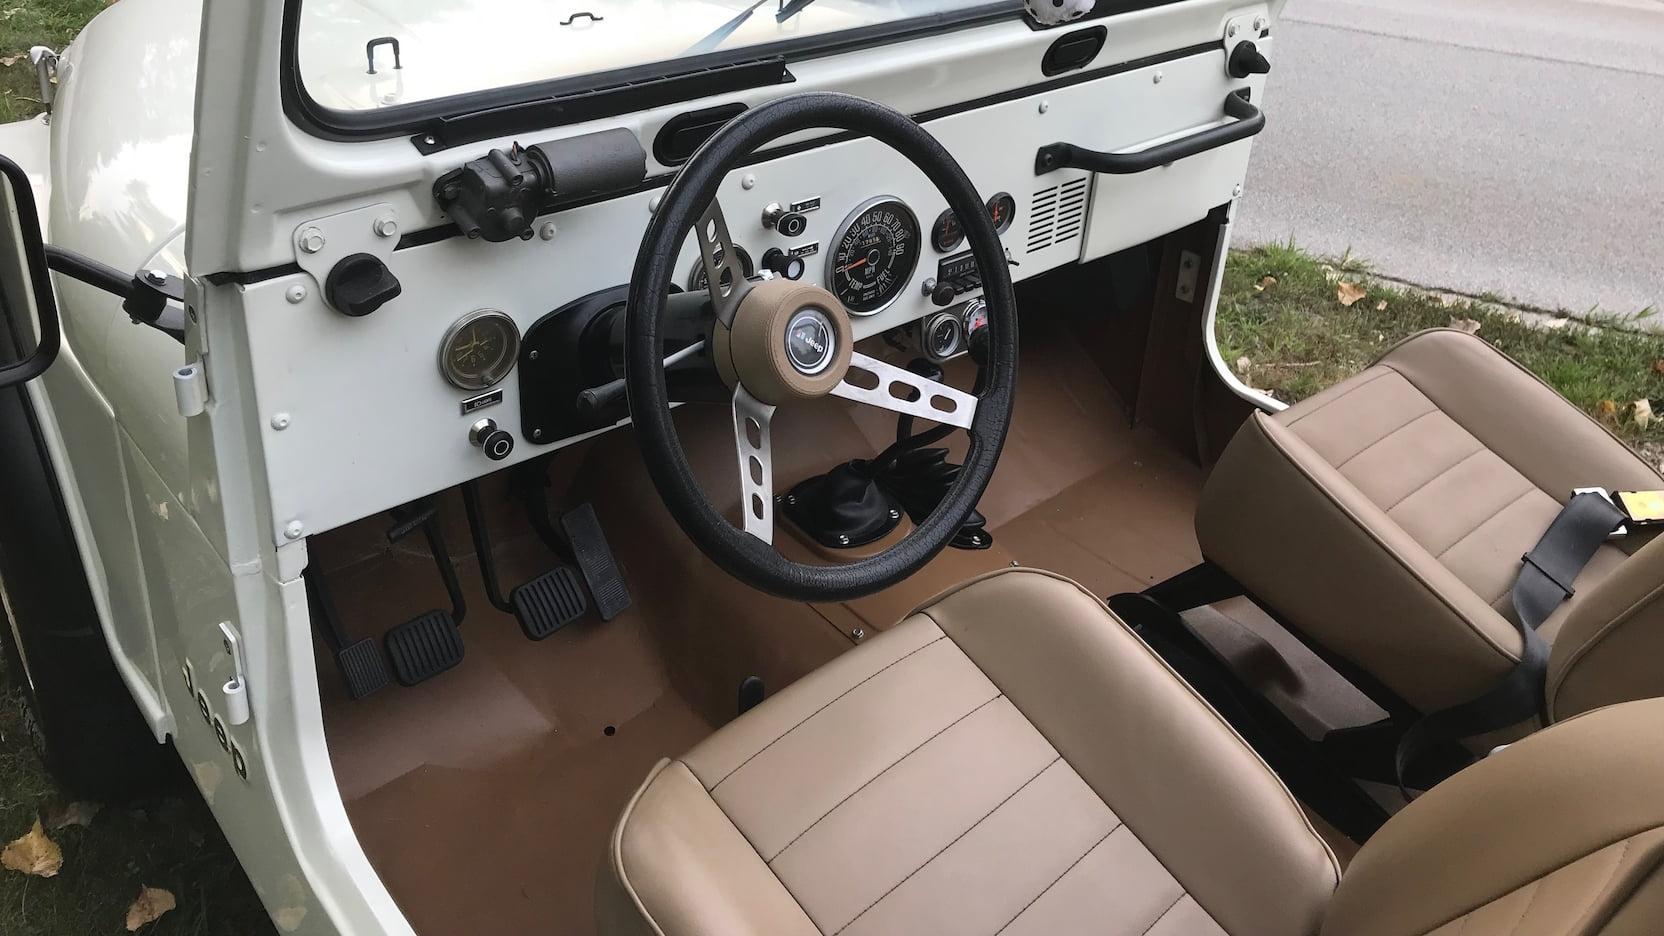 1977 Jeep CJ-7 interior steering wheel